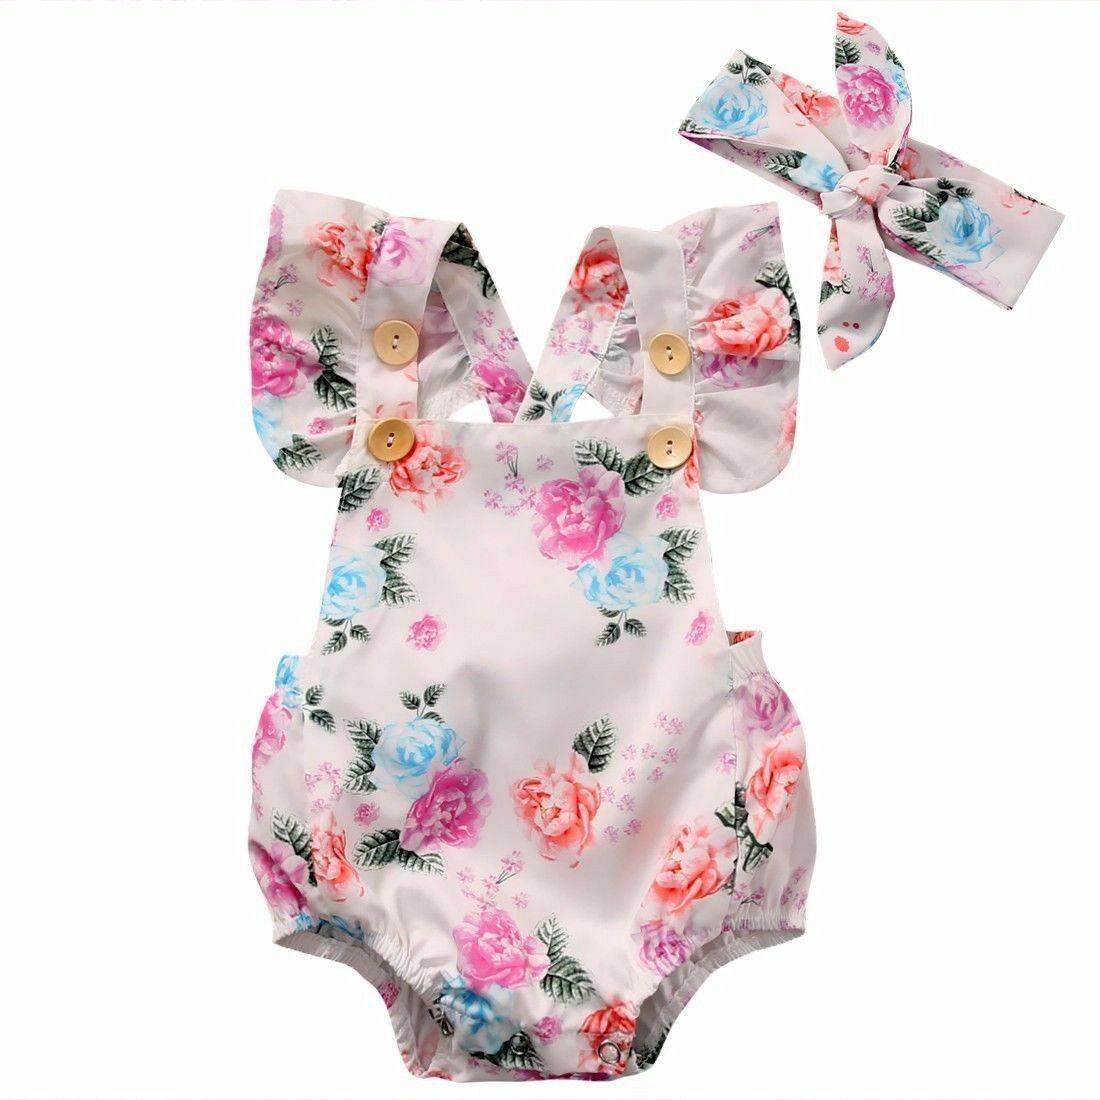 Newborn Baby Girls Floral Bodysuit Jumpsuit Short Sleeveless Summer Baby Kids Clothes Bodysuit+ Headband 2Pcs Sunsuit Outfit Set